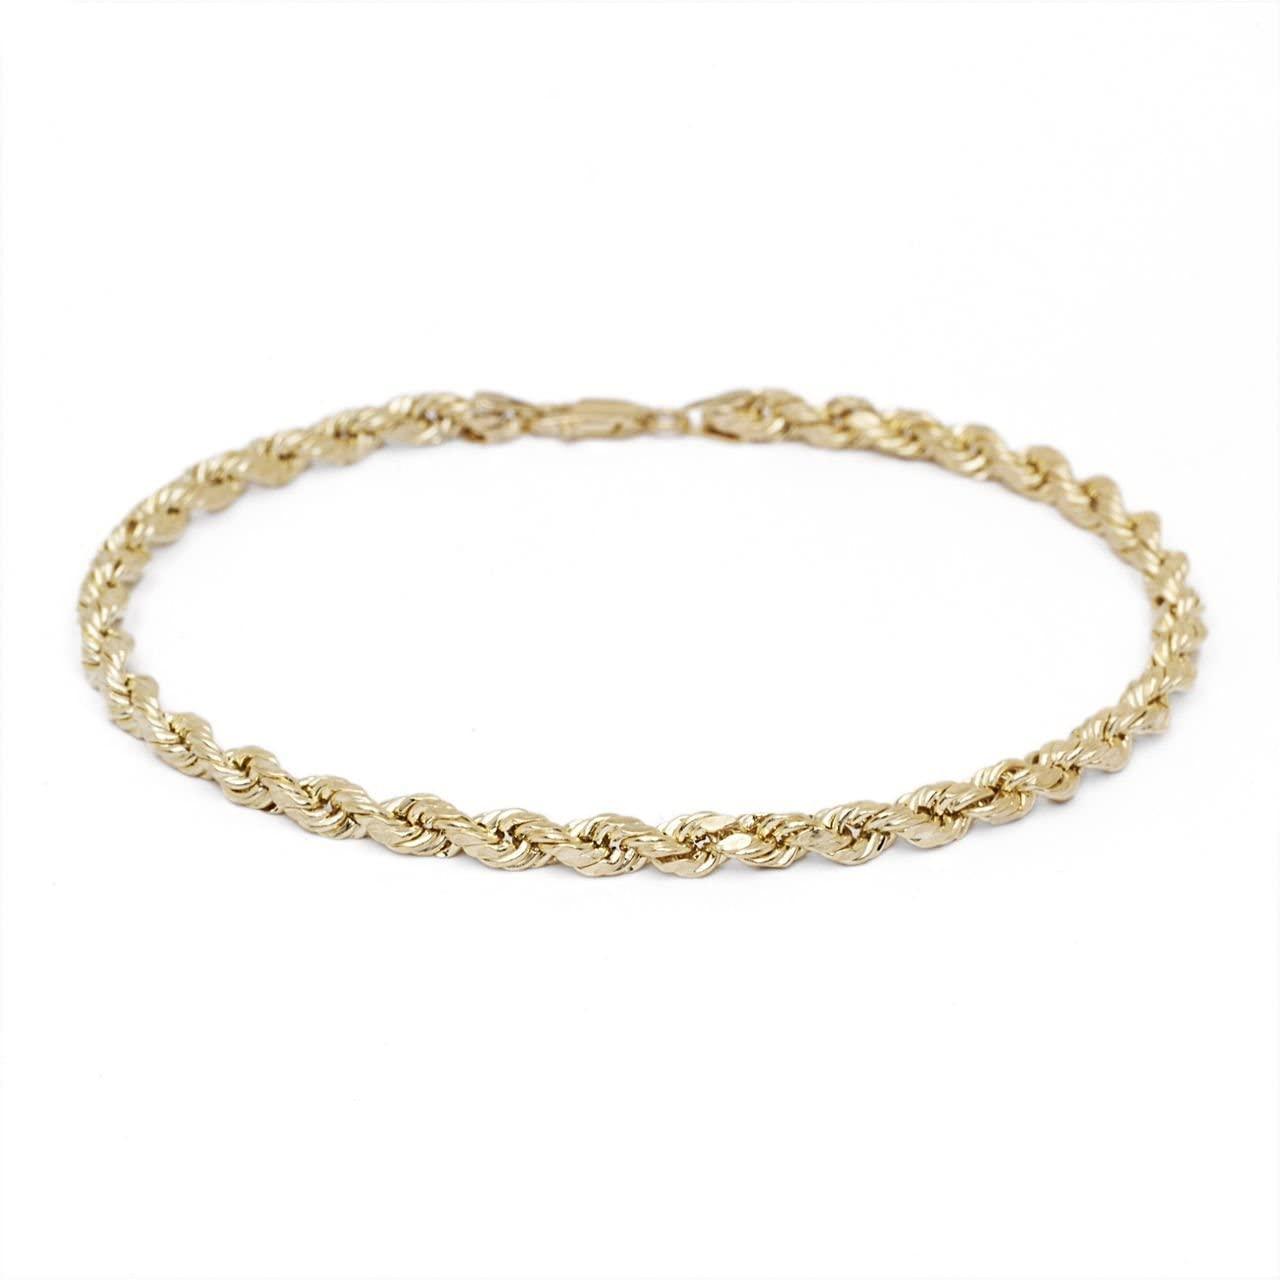 MCS Jewelry 10 Karat Solid Diamond Cut Rope Chain Bracelet Yellow Gold ( 1.8mm )